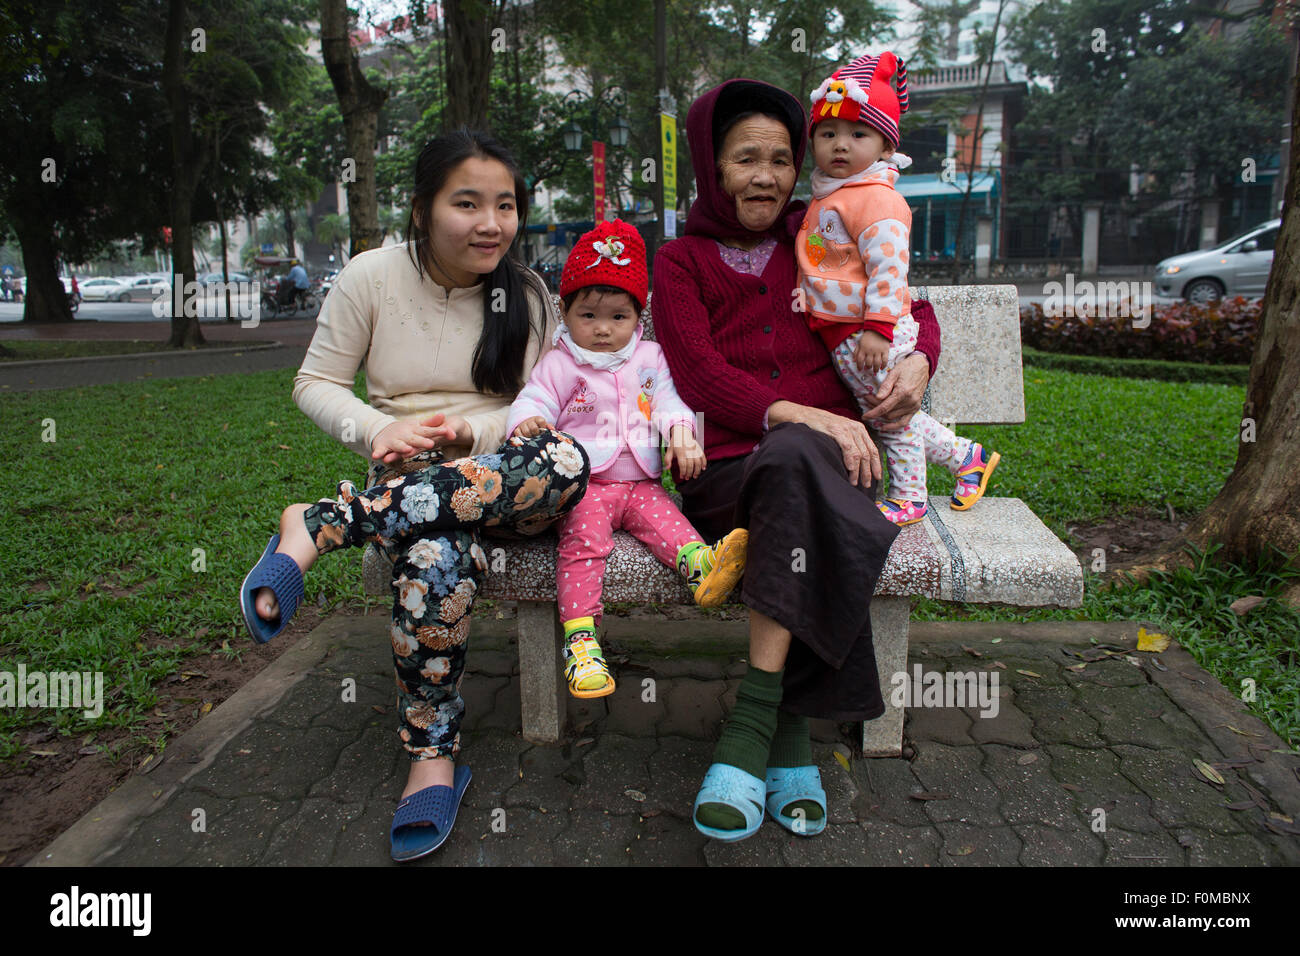 three generations in Hanoi - Stock Image